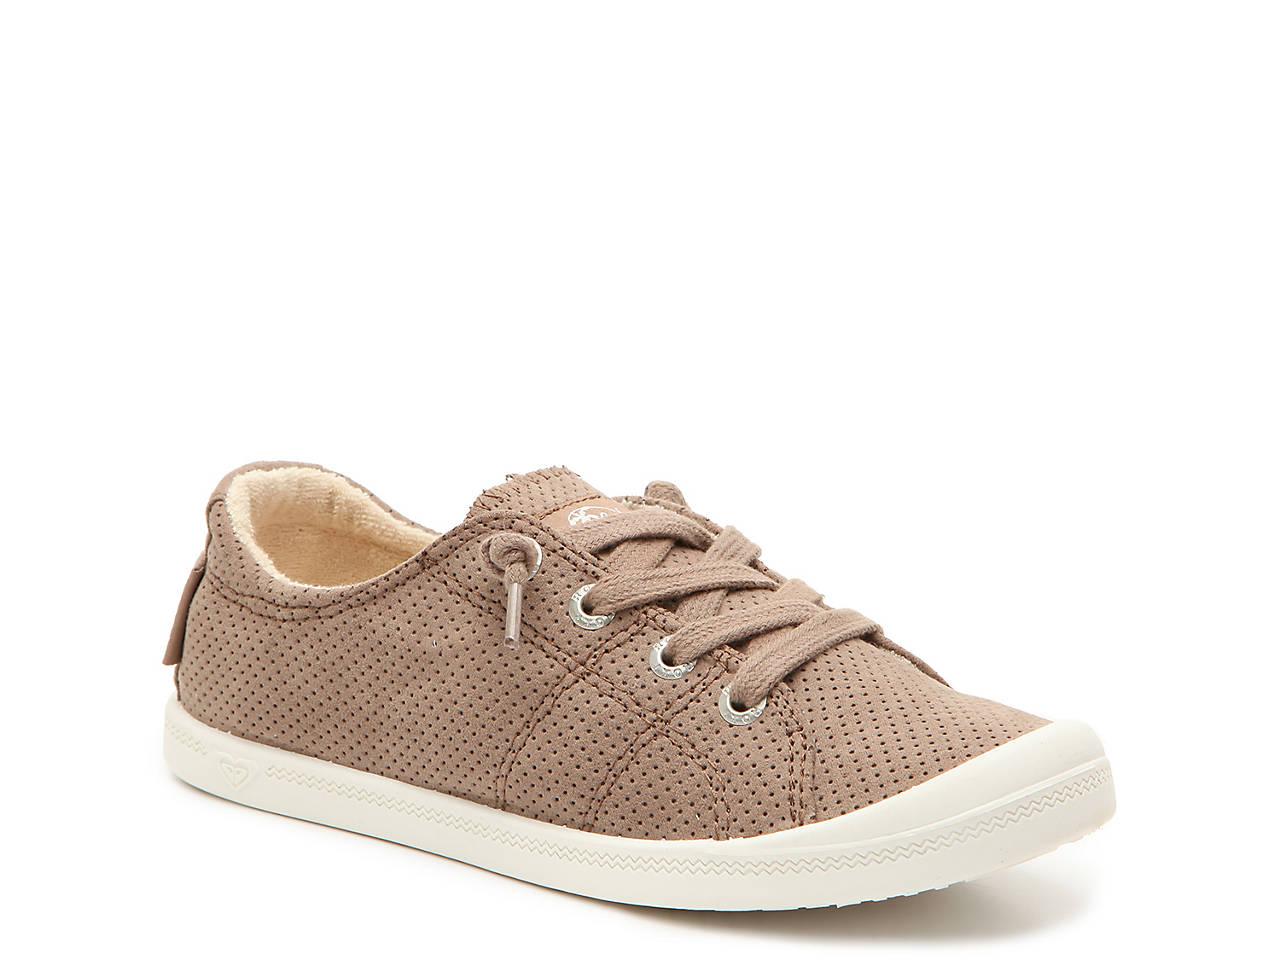 4ca89533bc51 Roxy Bayshore III Slip-On Sneaker Women s Shoes